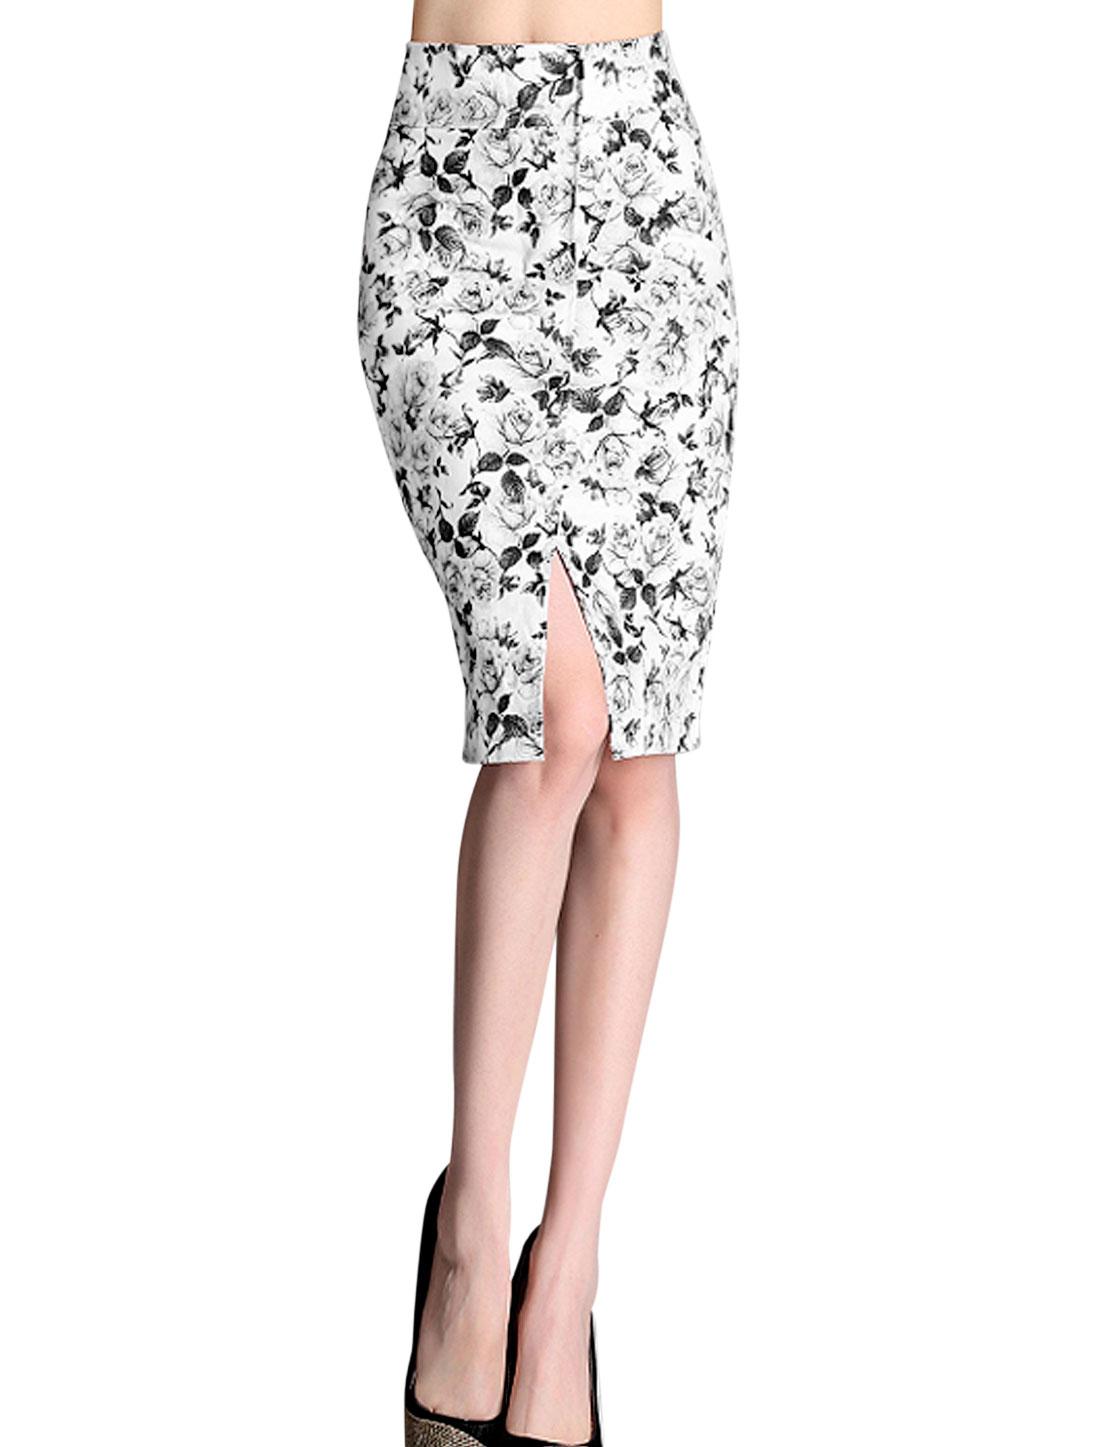 Lady Chic Floral Prints Hidden Zipper Fake Pockets Pencil Skirt Light Gray XS